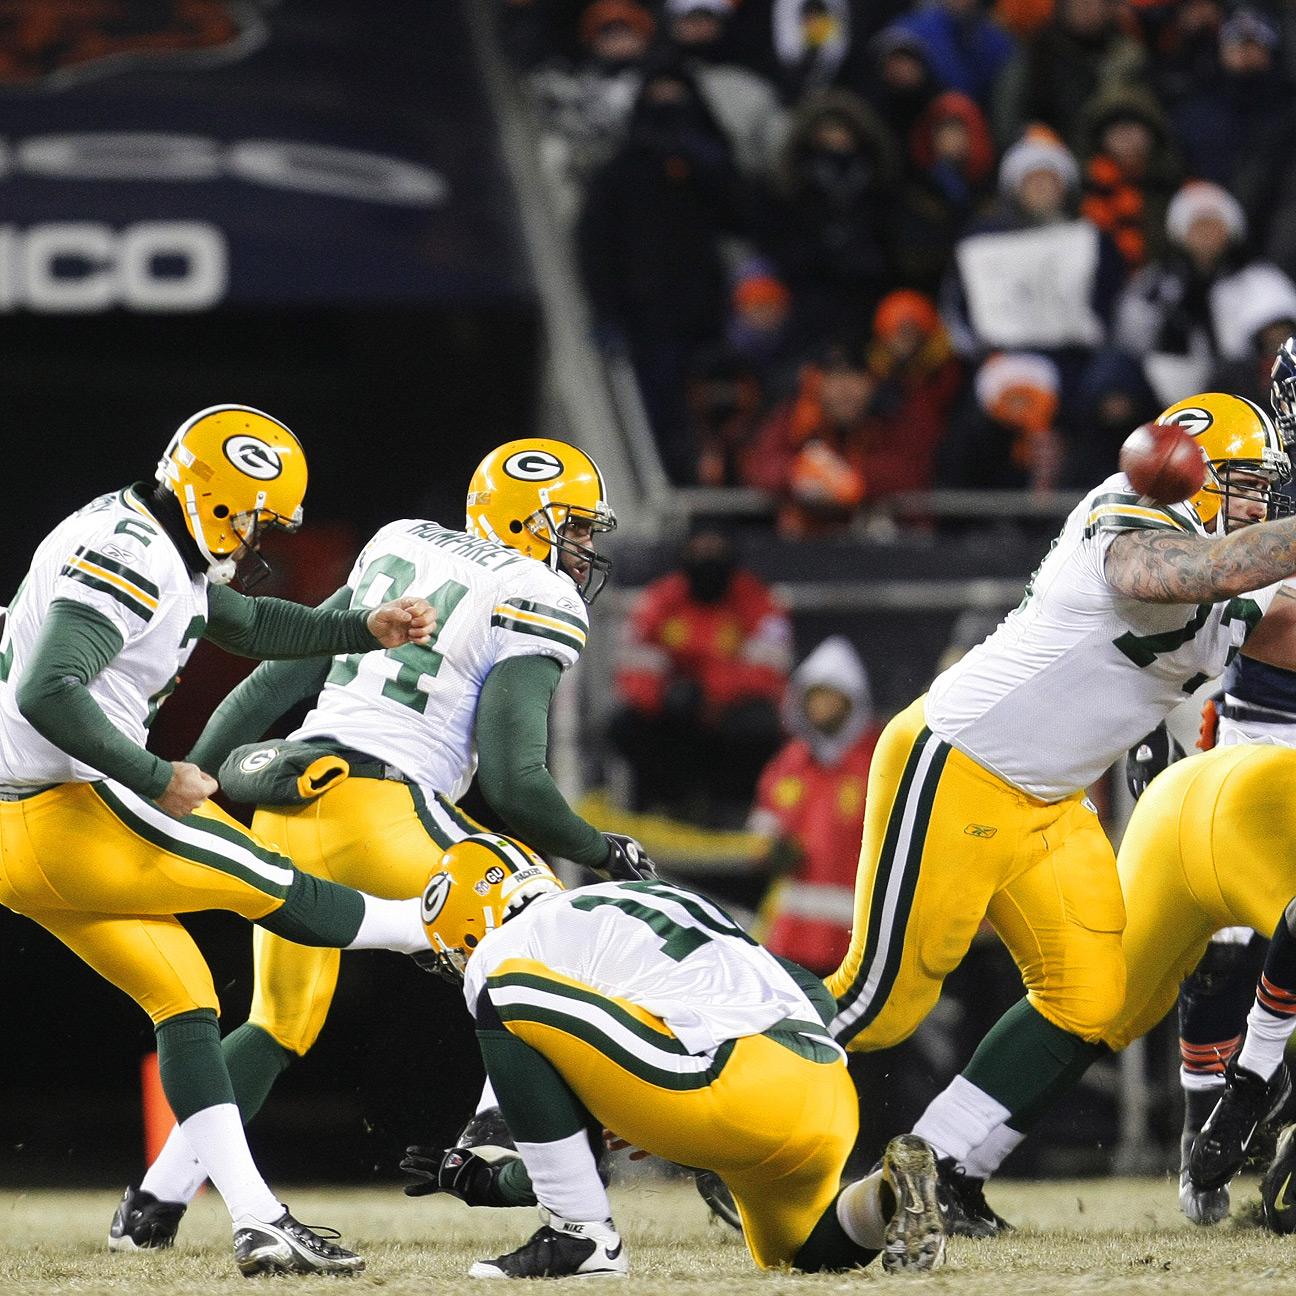 Green Bay Packers rank 127th in ESPN salary survey